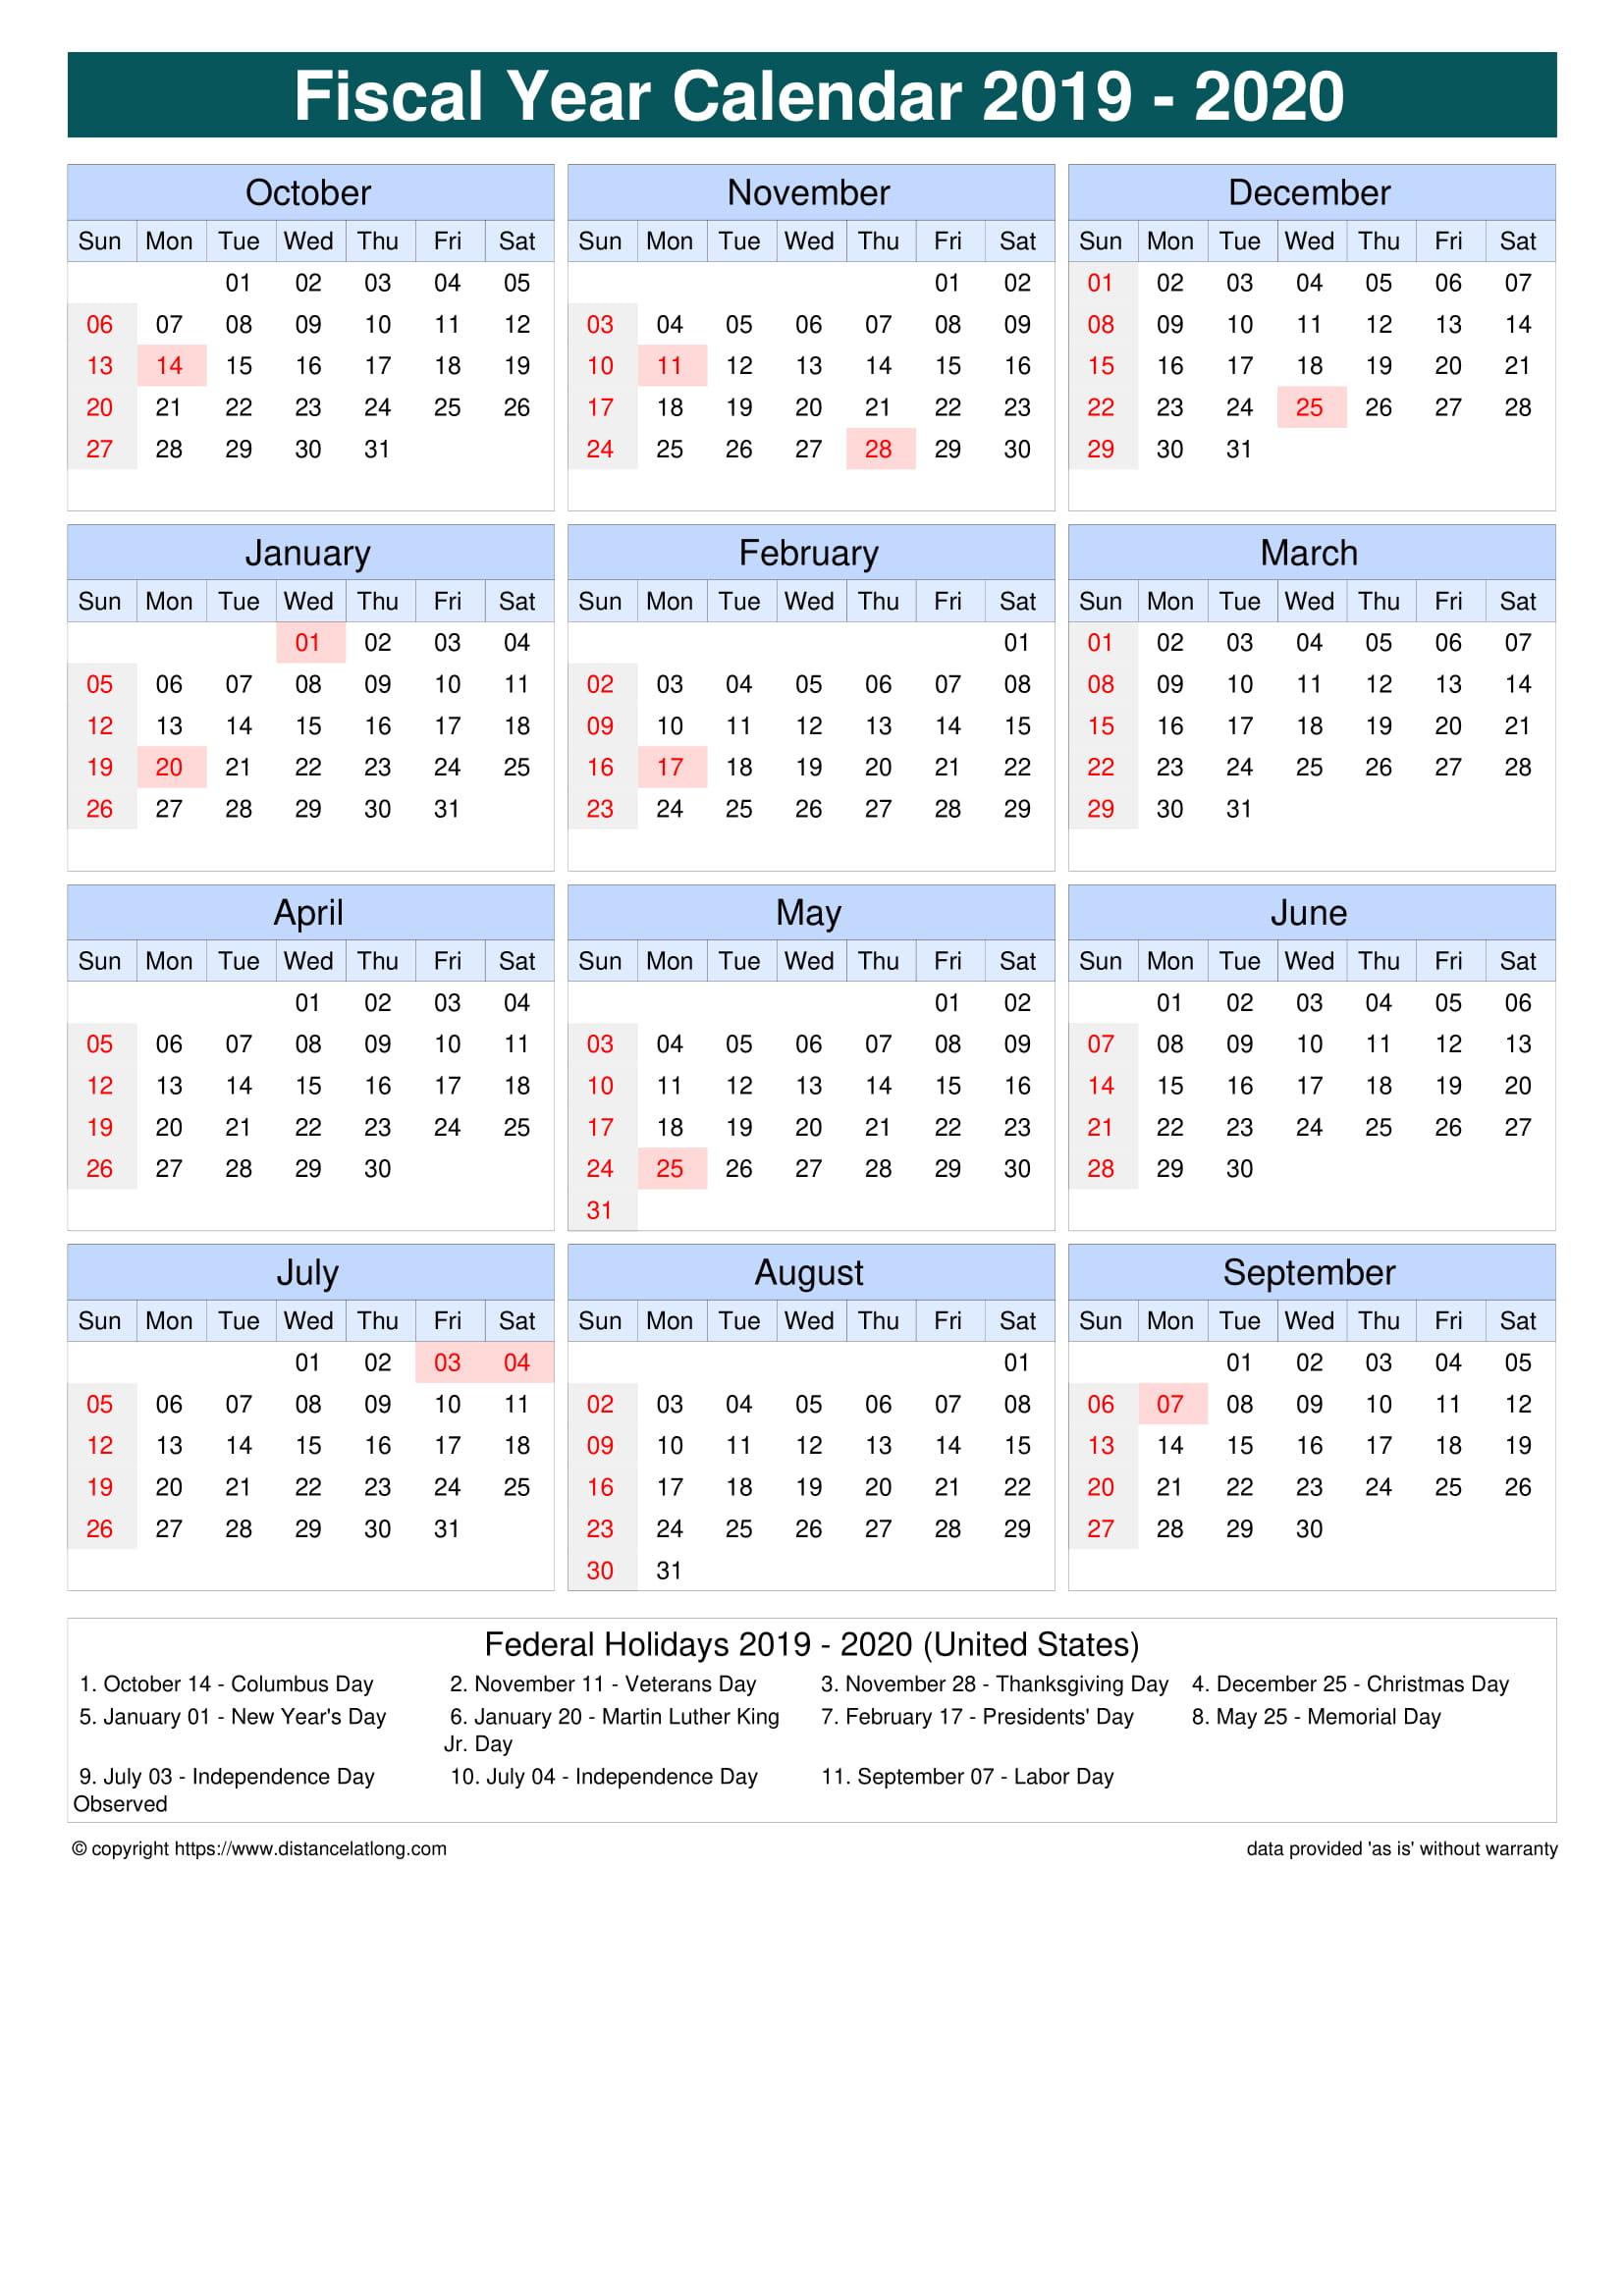 Fiscal Year 2019-2020 Calendar Templates, Free Printable inside Fiscal Calendar For October 2020